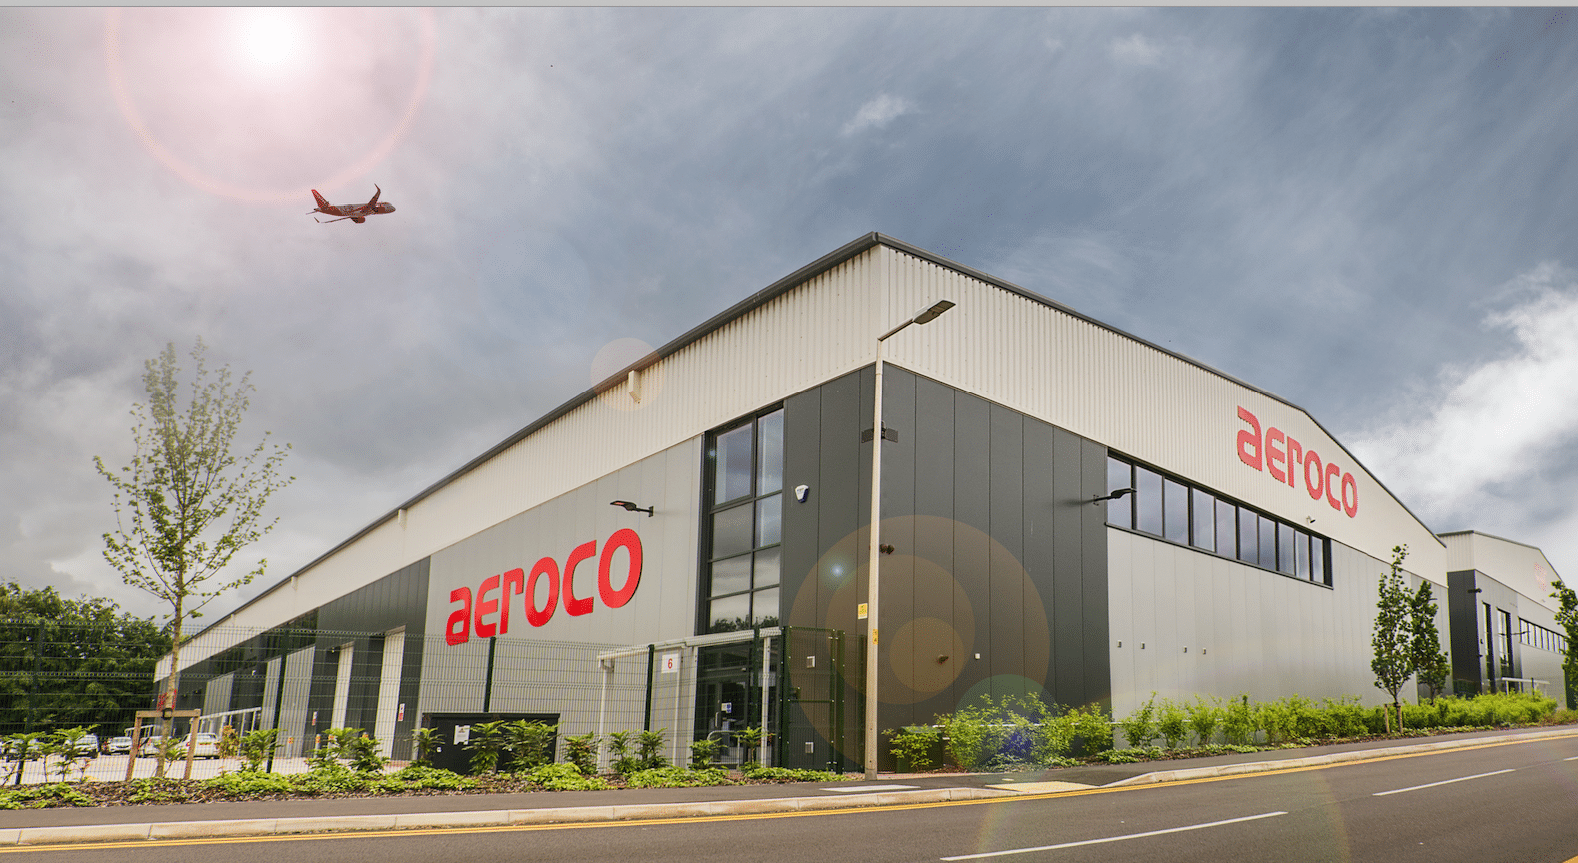 Plane flying over Aeroco HQ